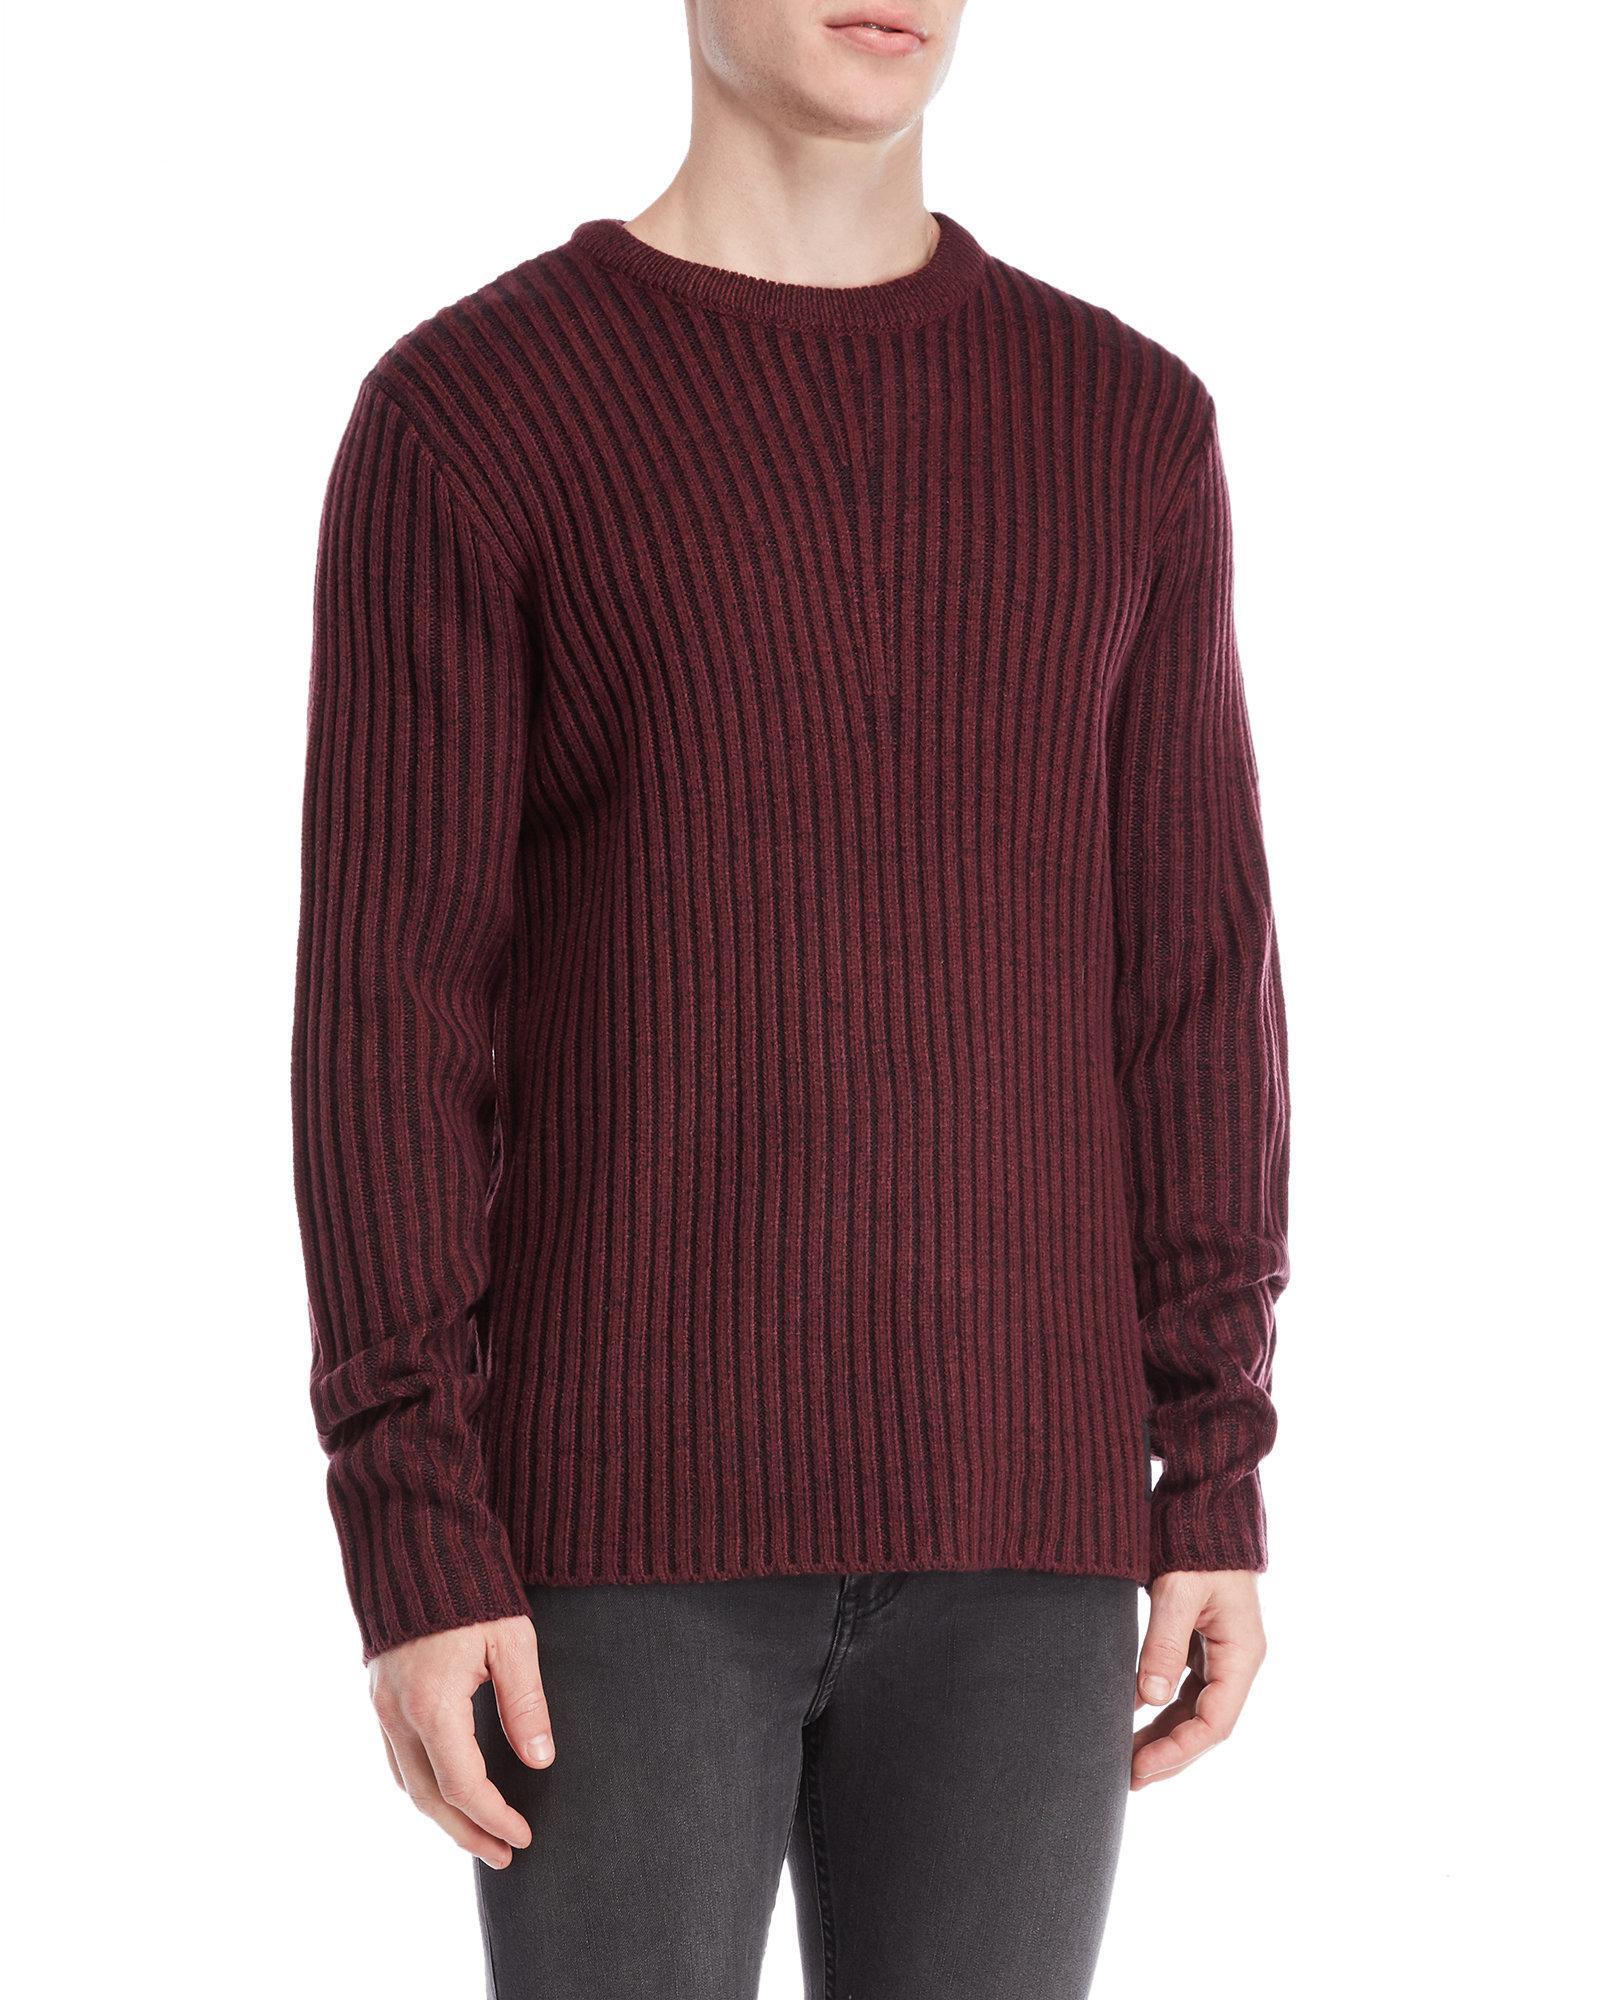 to wear - Find Shoppingfab hm rib knit sweater video